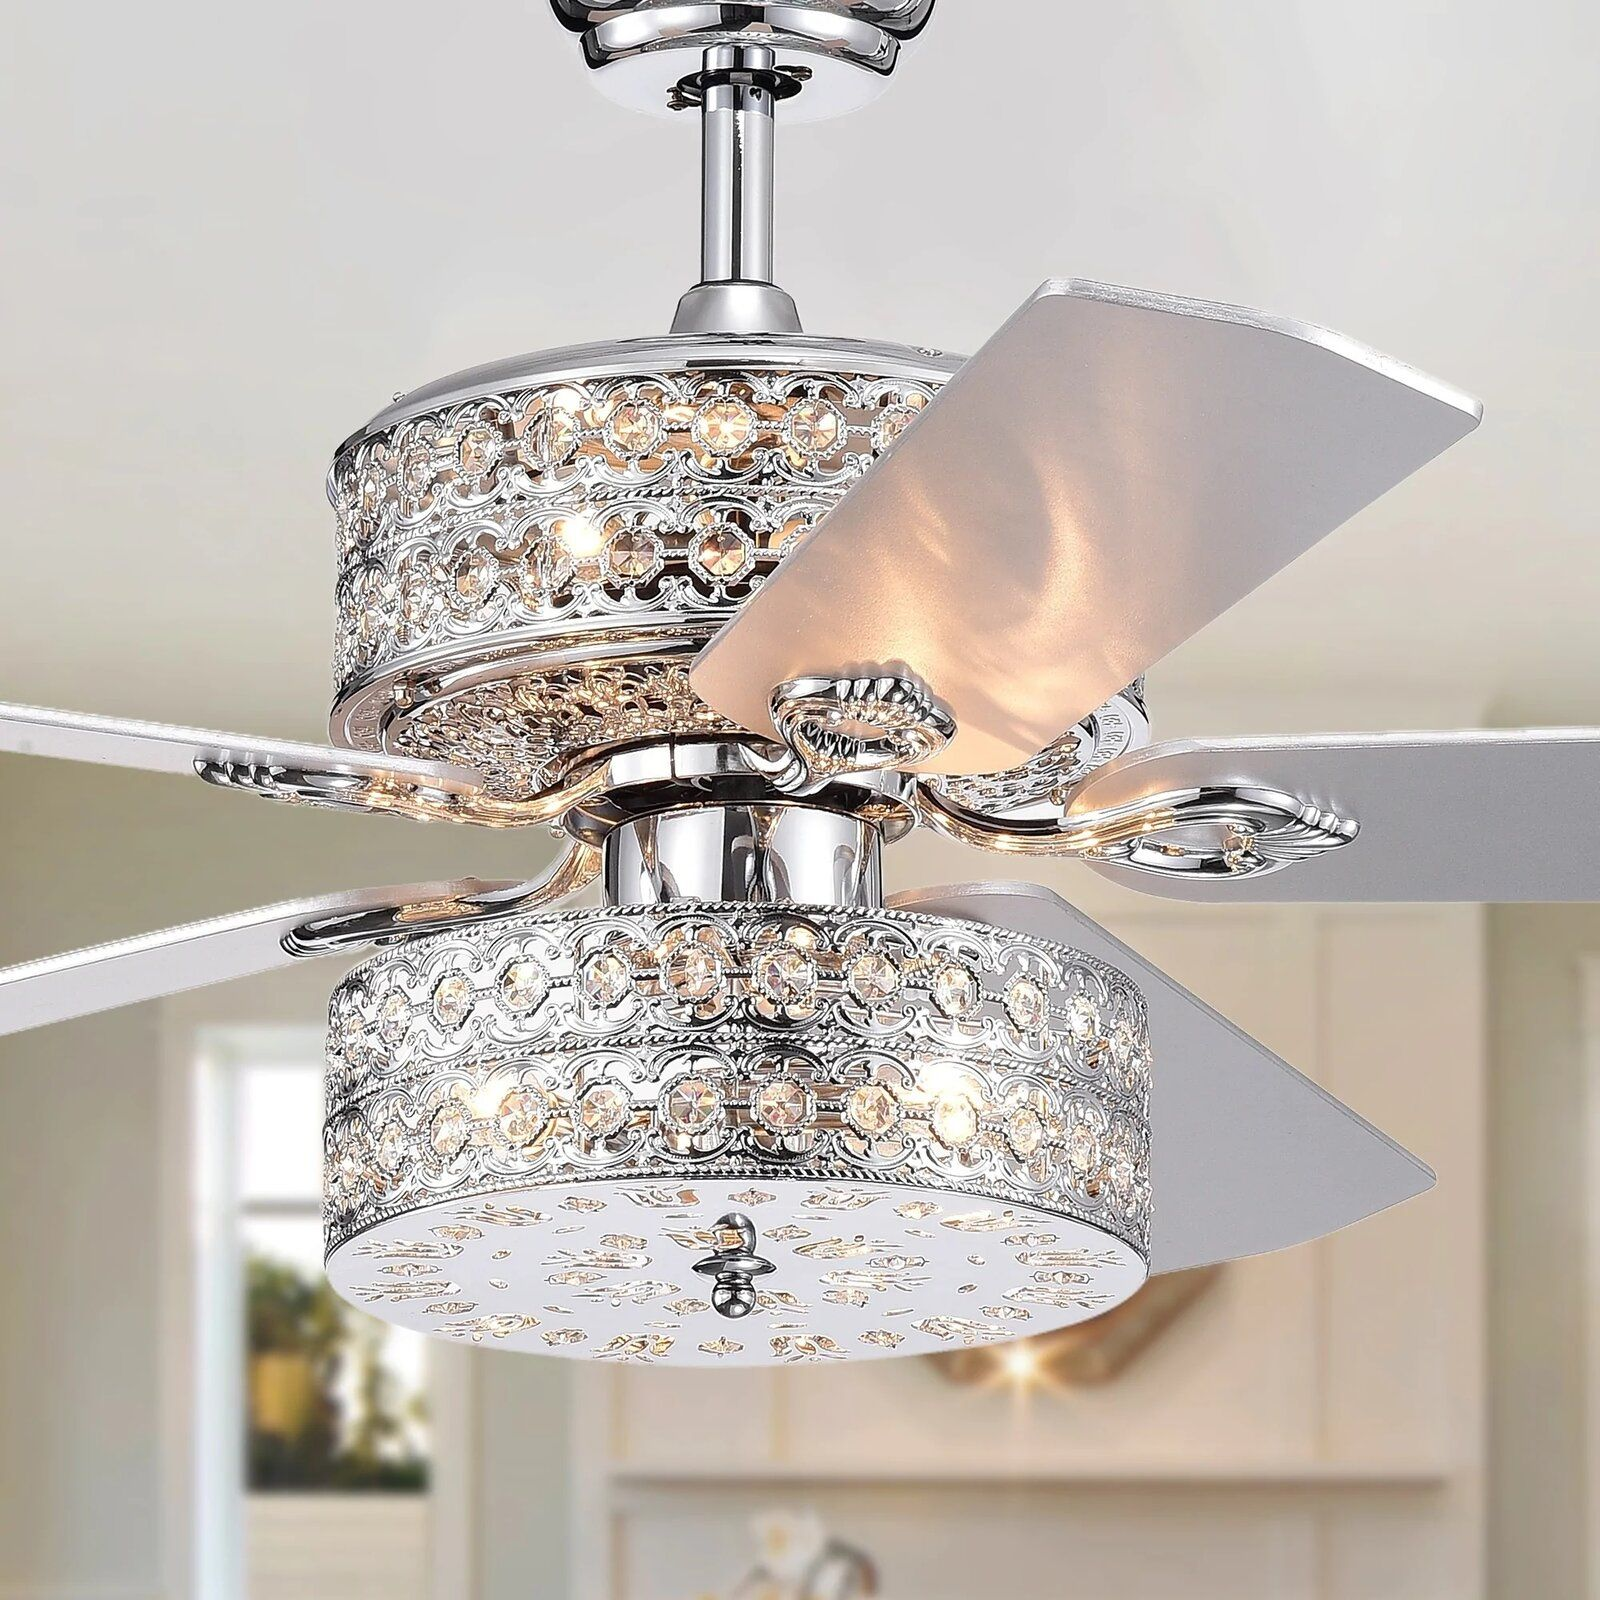 Rosdorf Park 52 Parma 5 Blade Crystal Ceiling Fan With Light Kit Included Wayfair Ceiling Fan Chandelier Chandelier Fan Ceiling Fan